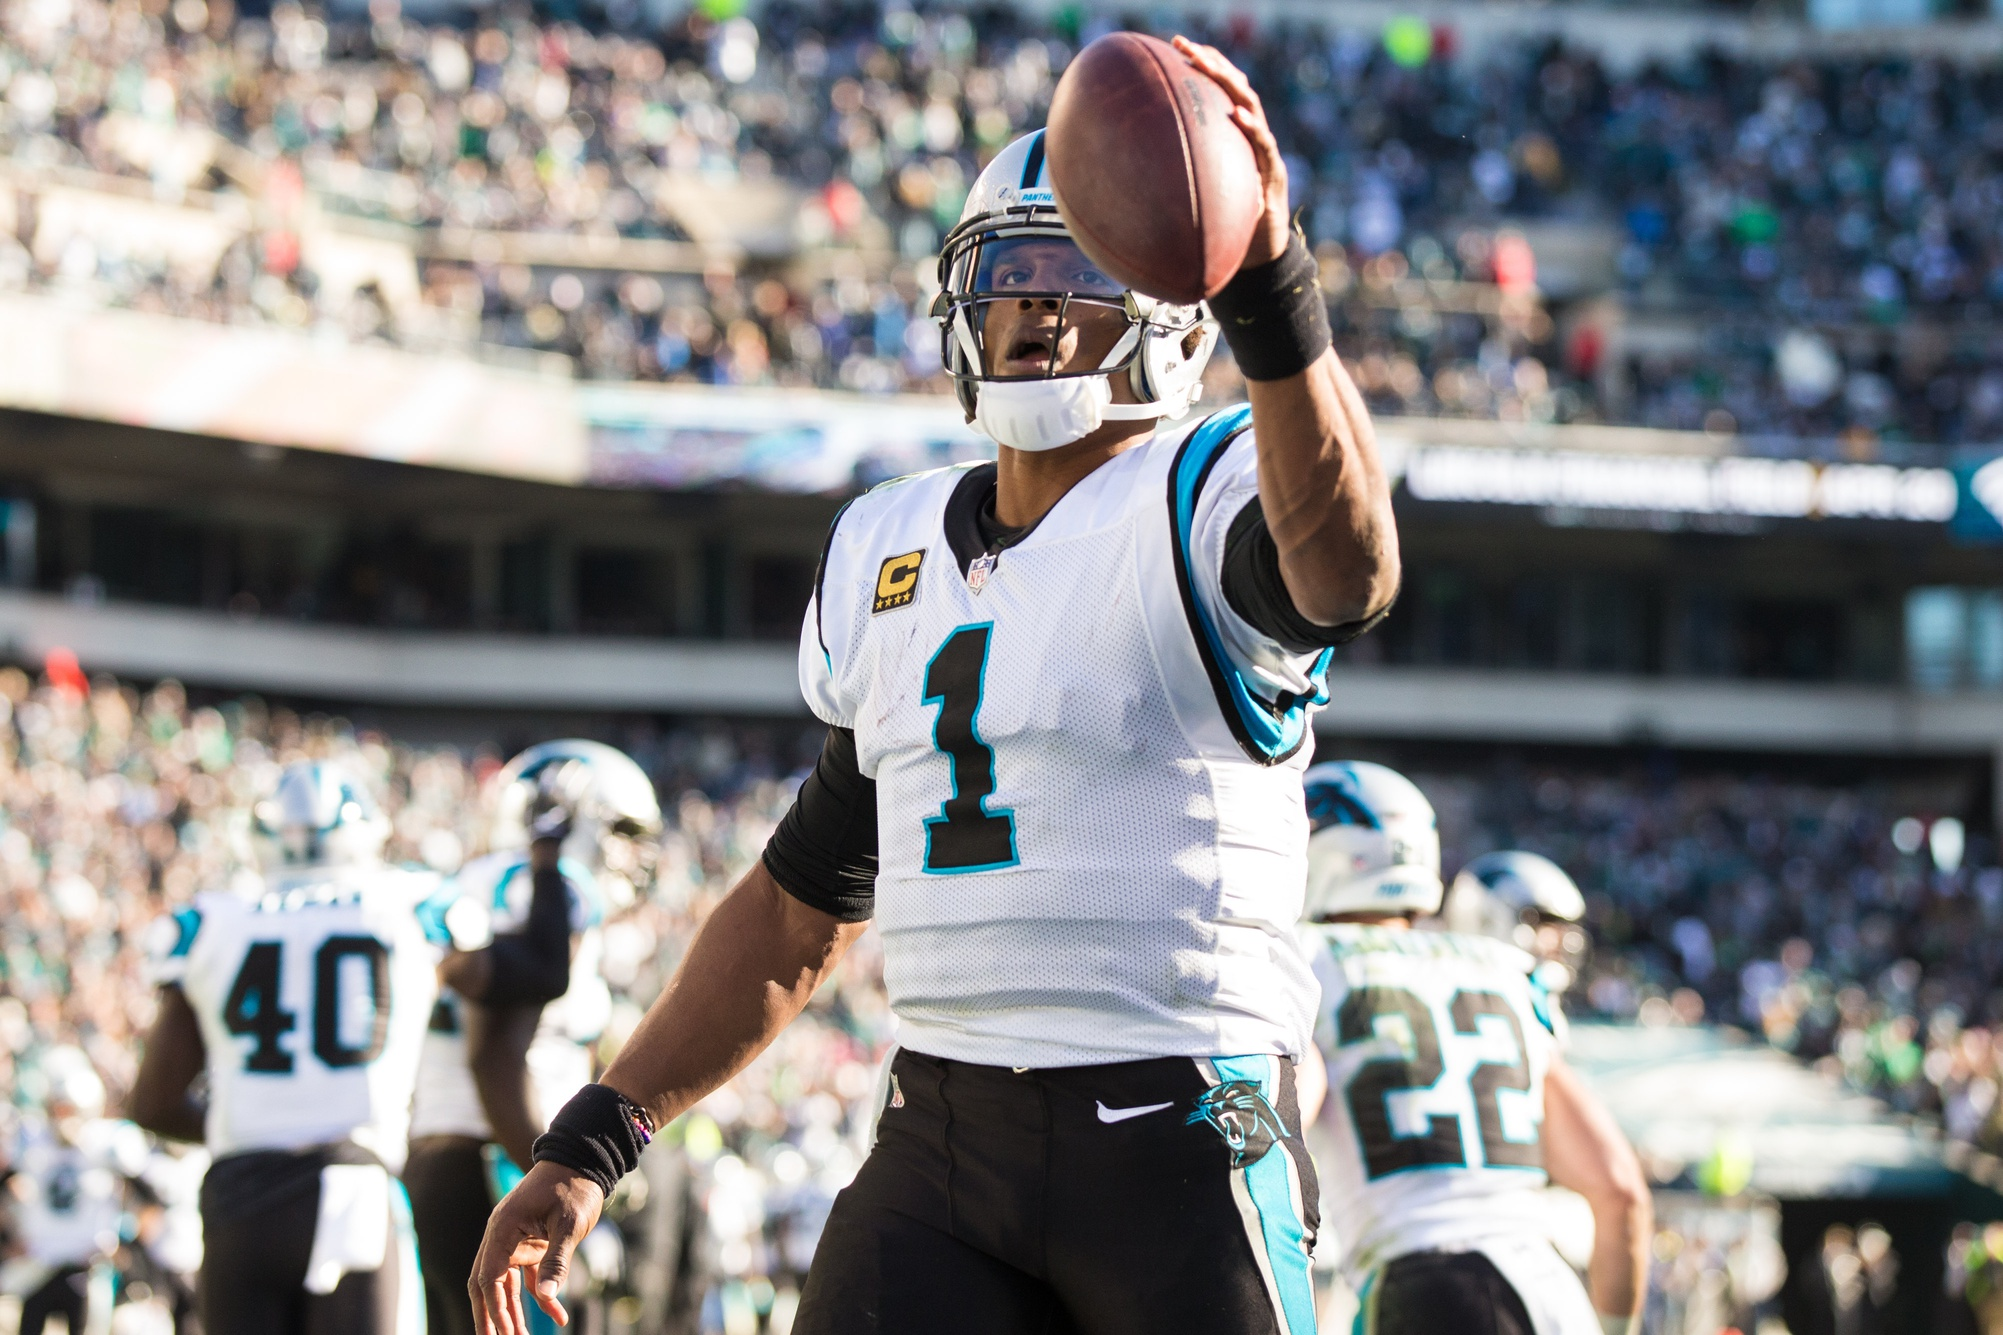 Refocused, NFL Week 7: Carolina Panthers 21, Philadelphia Eagles 17